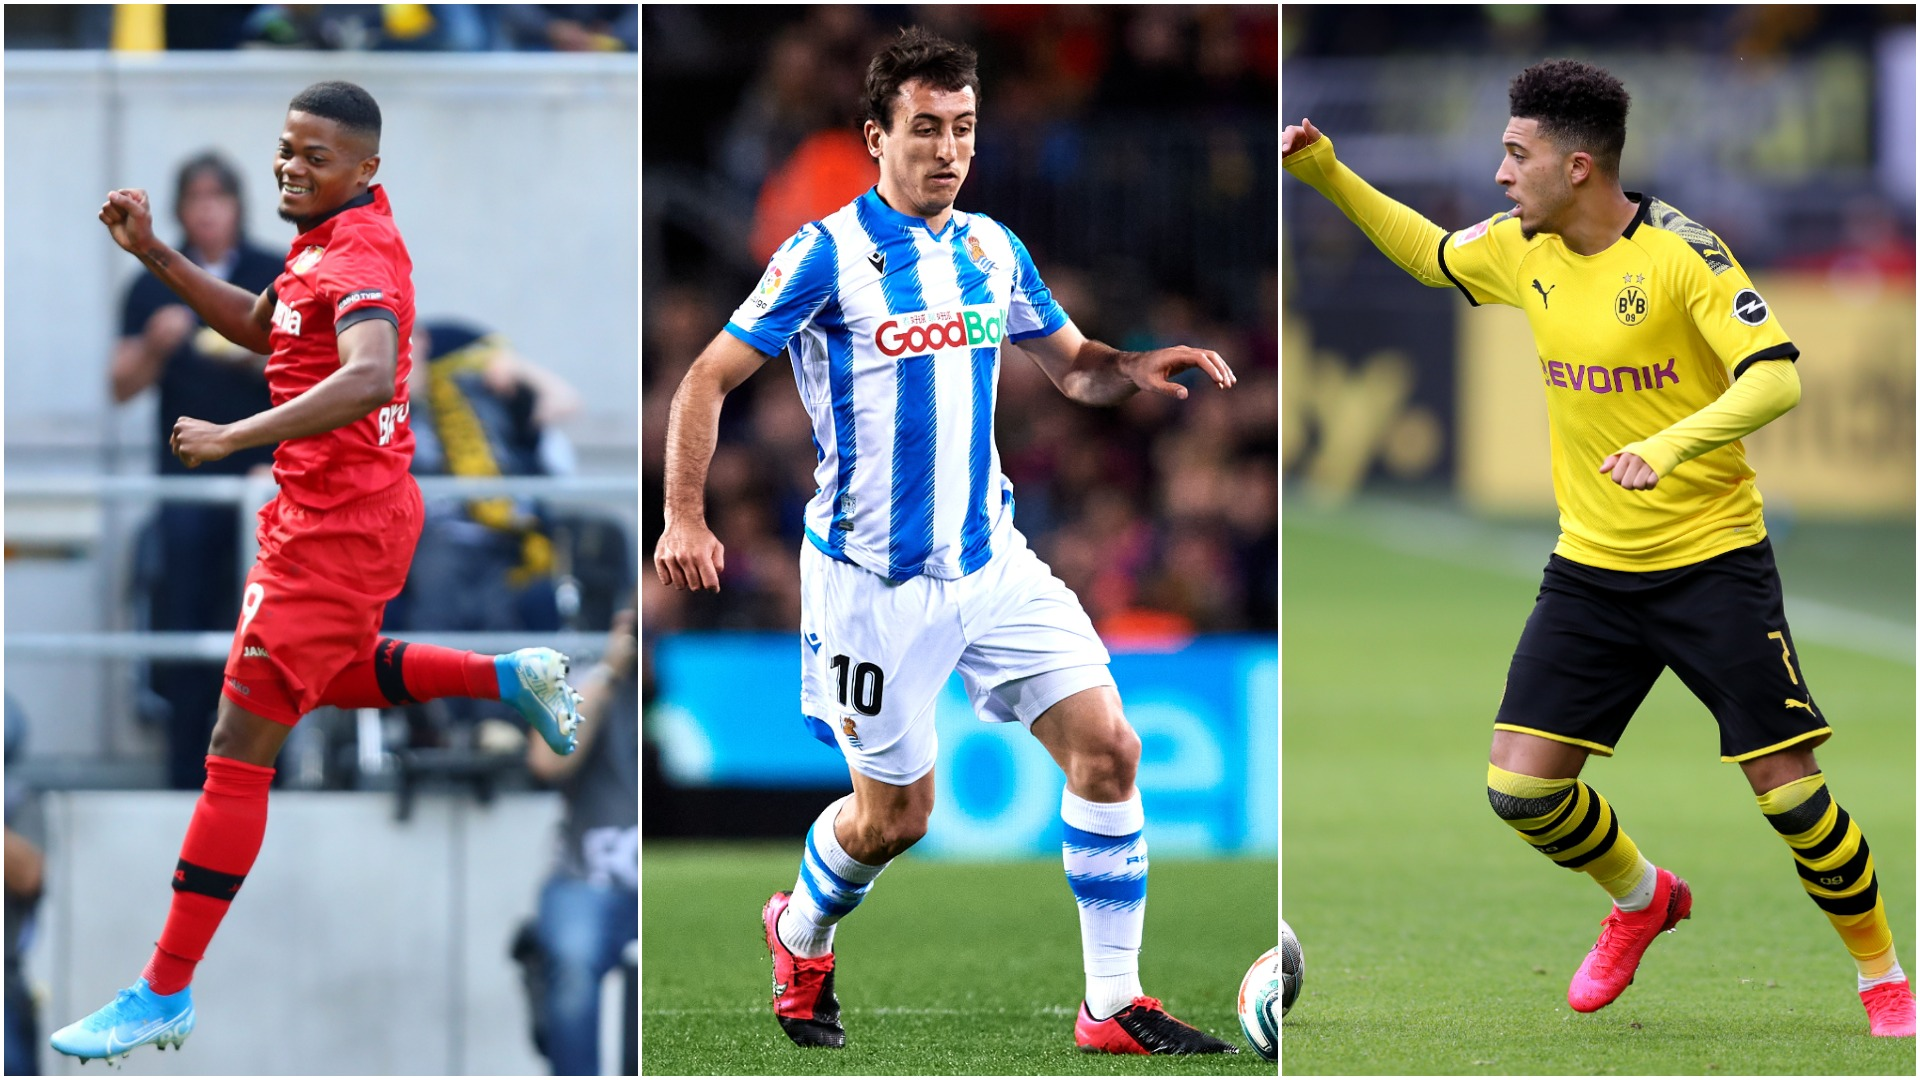 Sane leaving Man City: Bailey? Sancho? Traore? Who might Guardiola bring in?